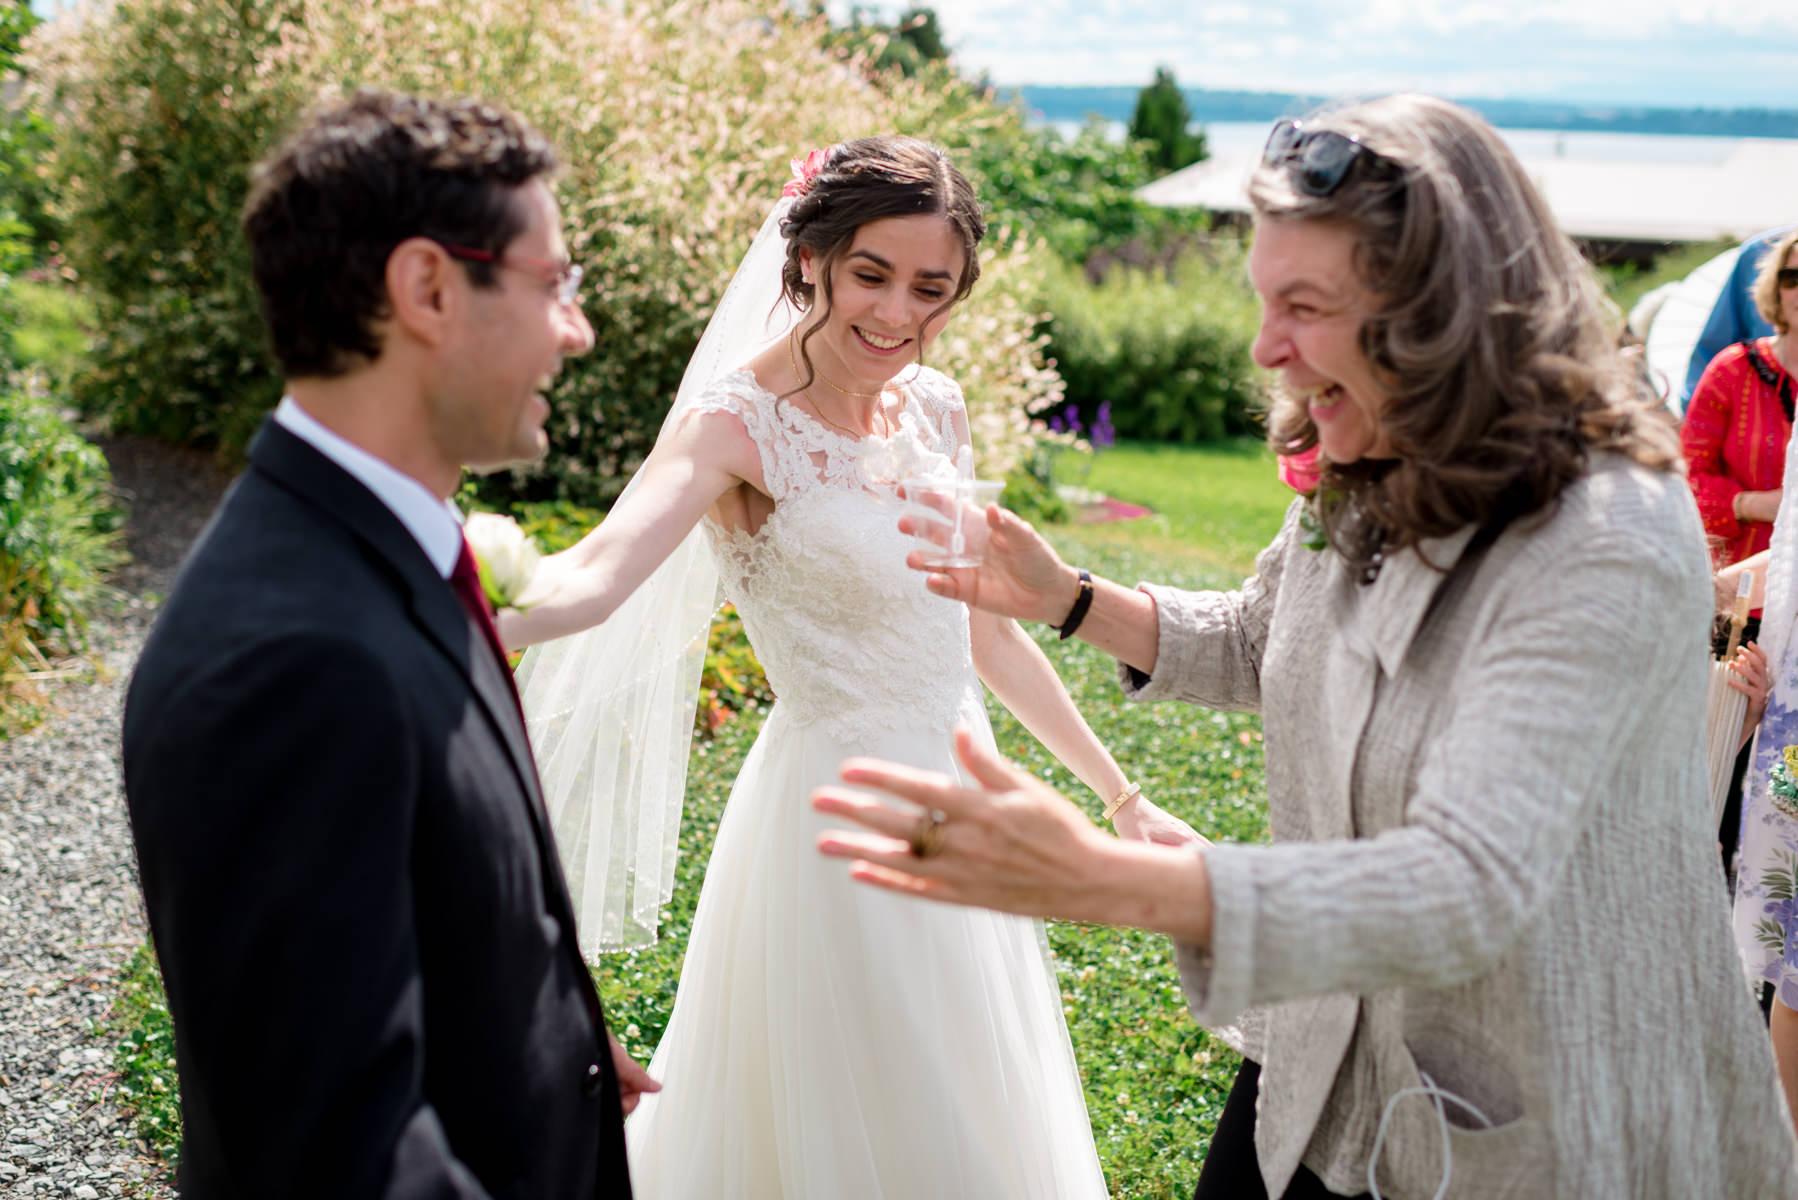 Andrew Tat - Documentary Wedding Photography - Kirkland, Washington - Emily & Cuauh - 21.JPG